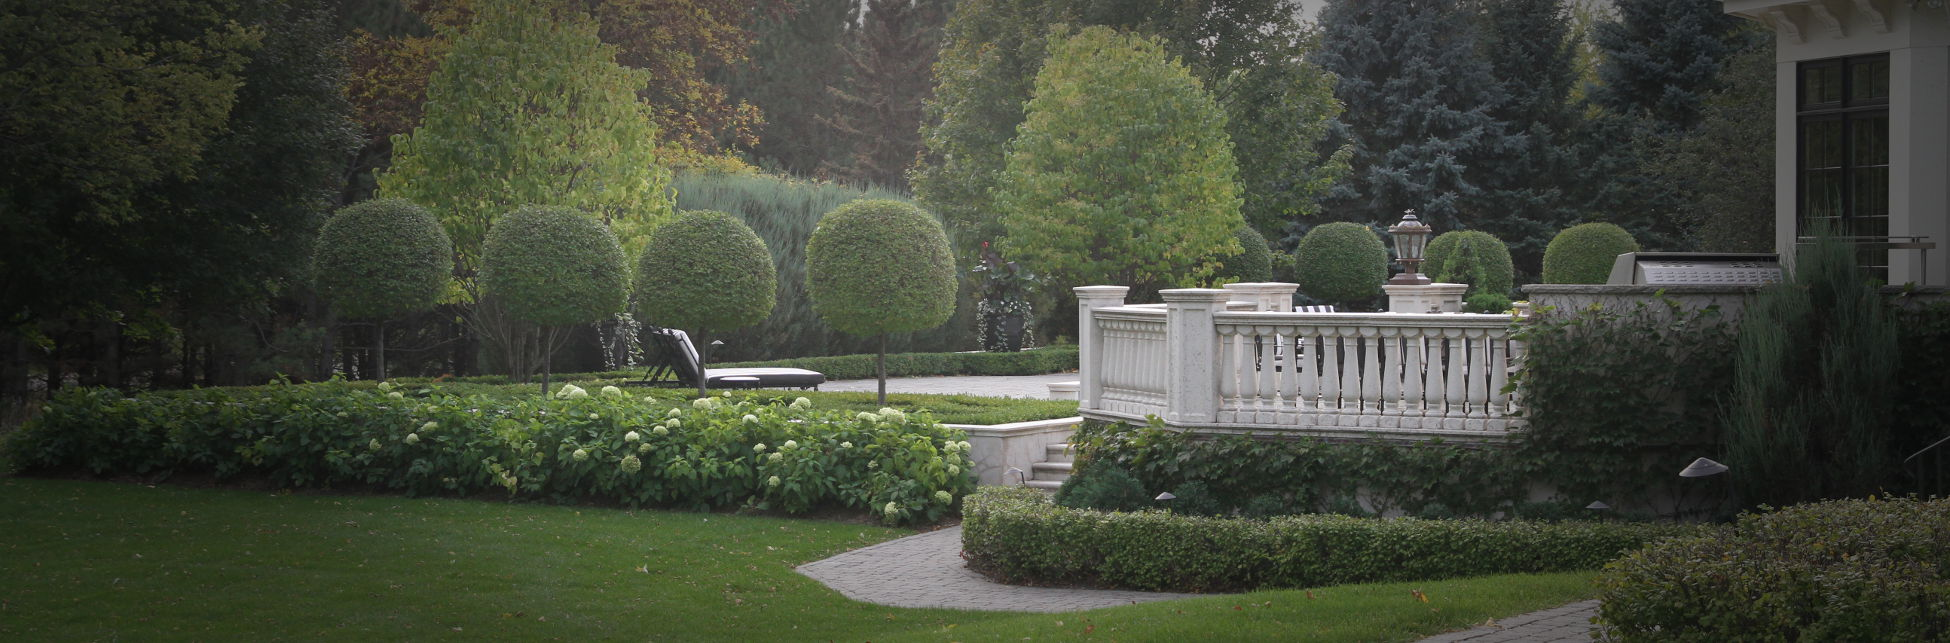 landscaping by Lan-De-Con